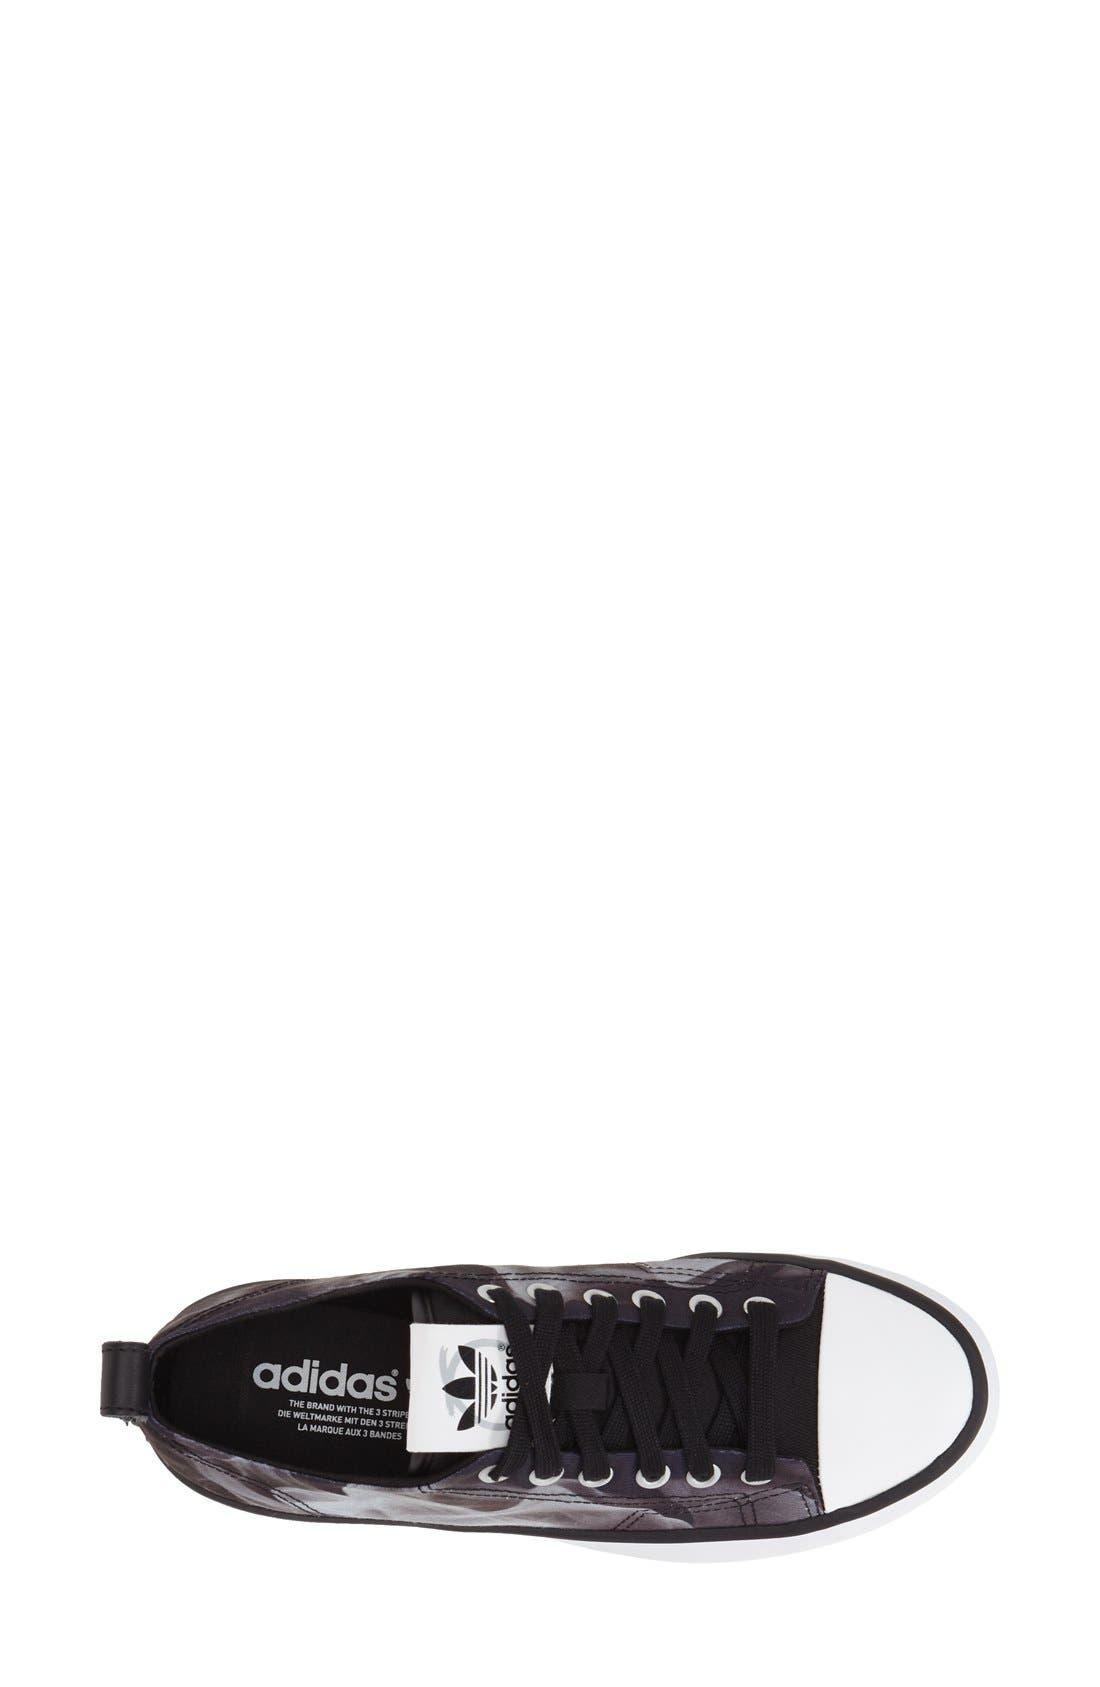 Alternate Image 3  - adidas 'Honey 2.0 - Rita Ora' Sneaker (Women)